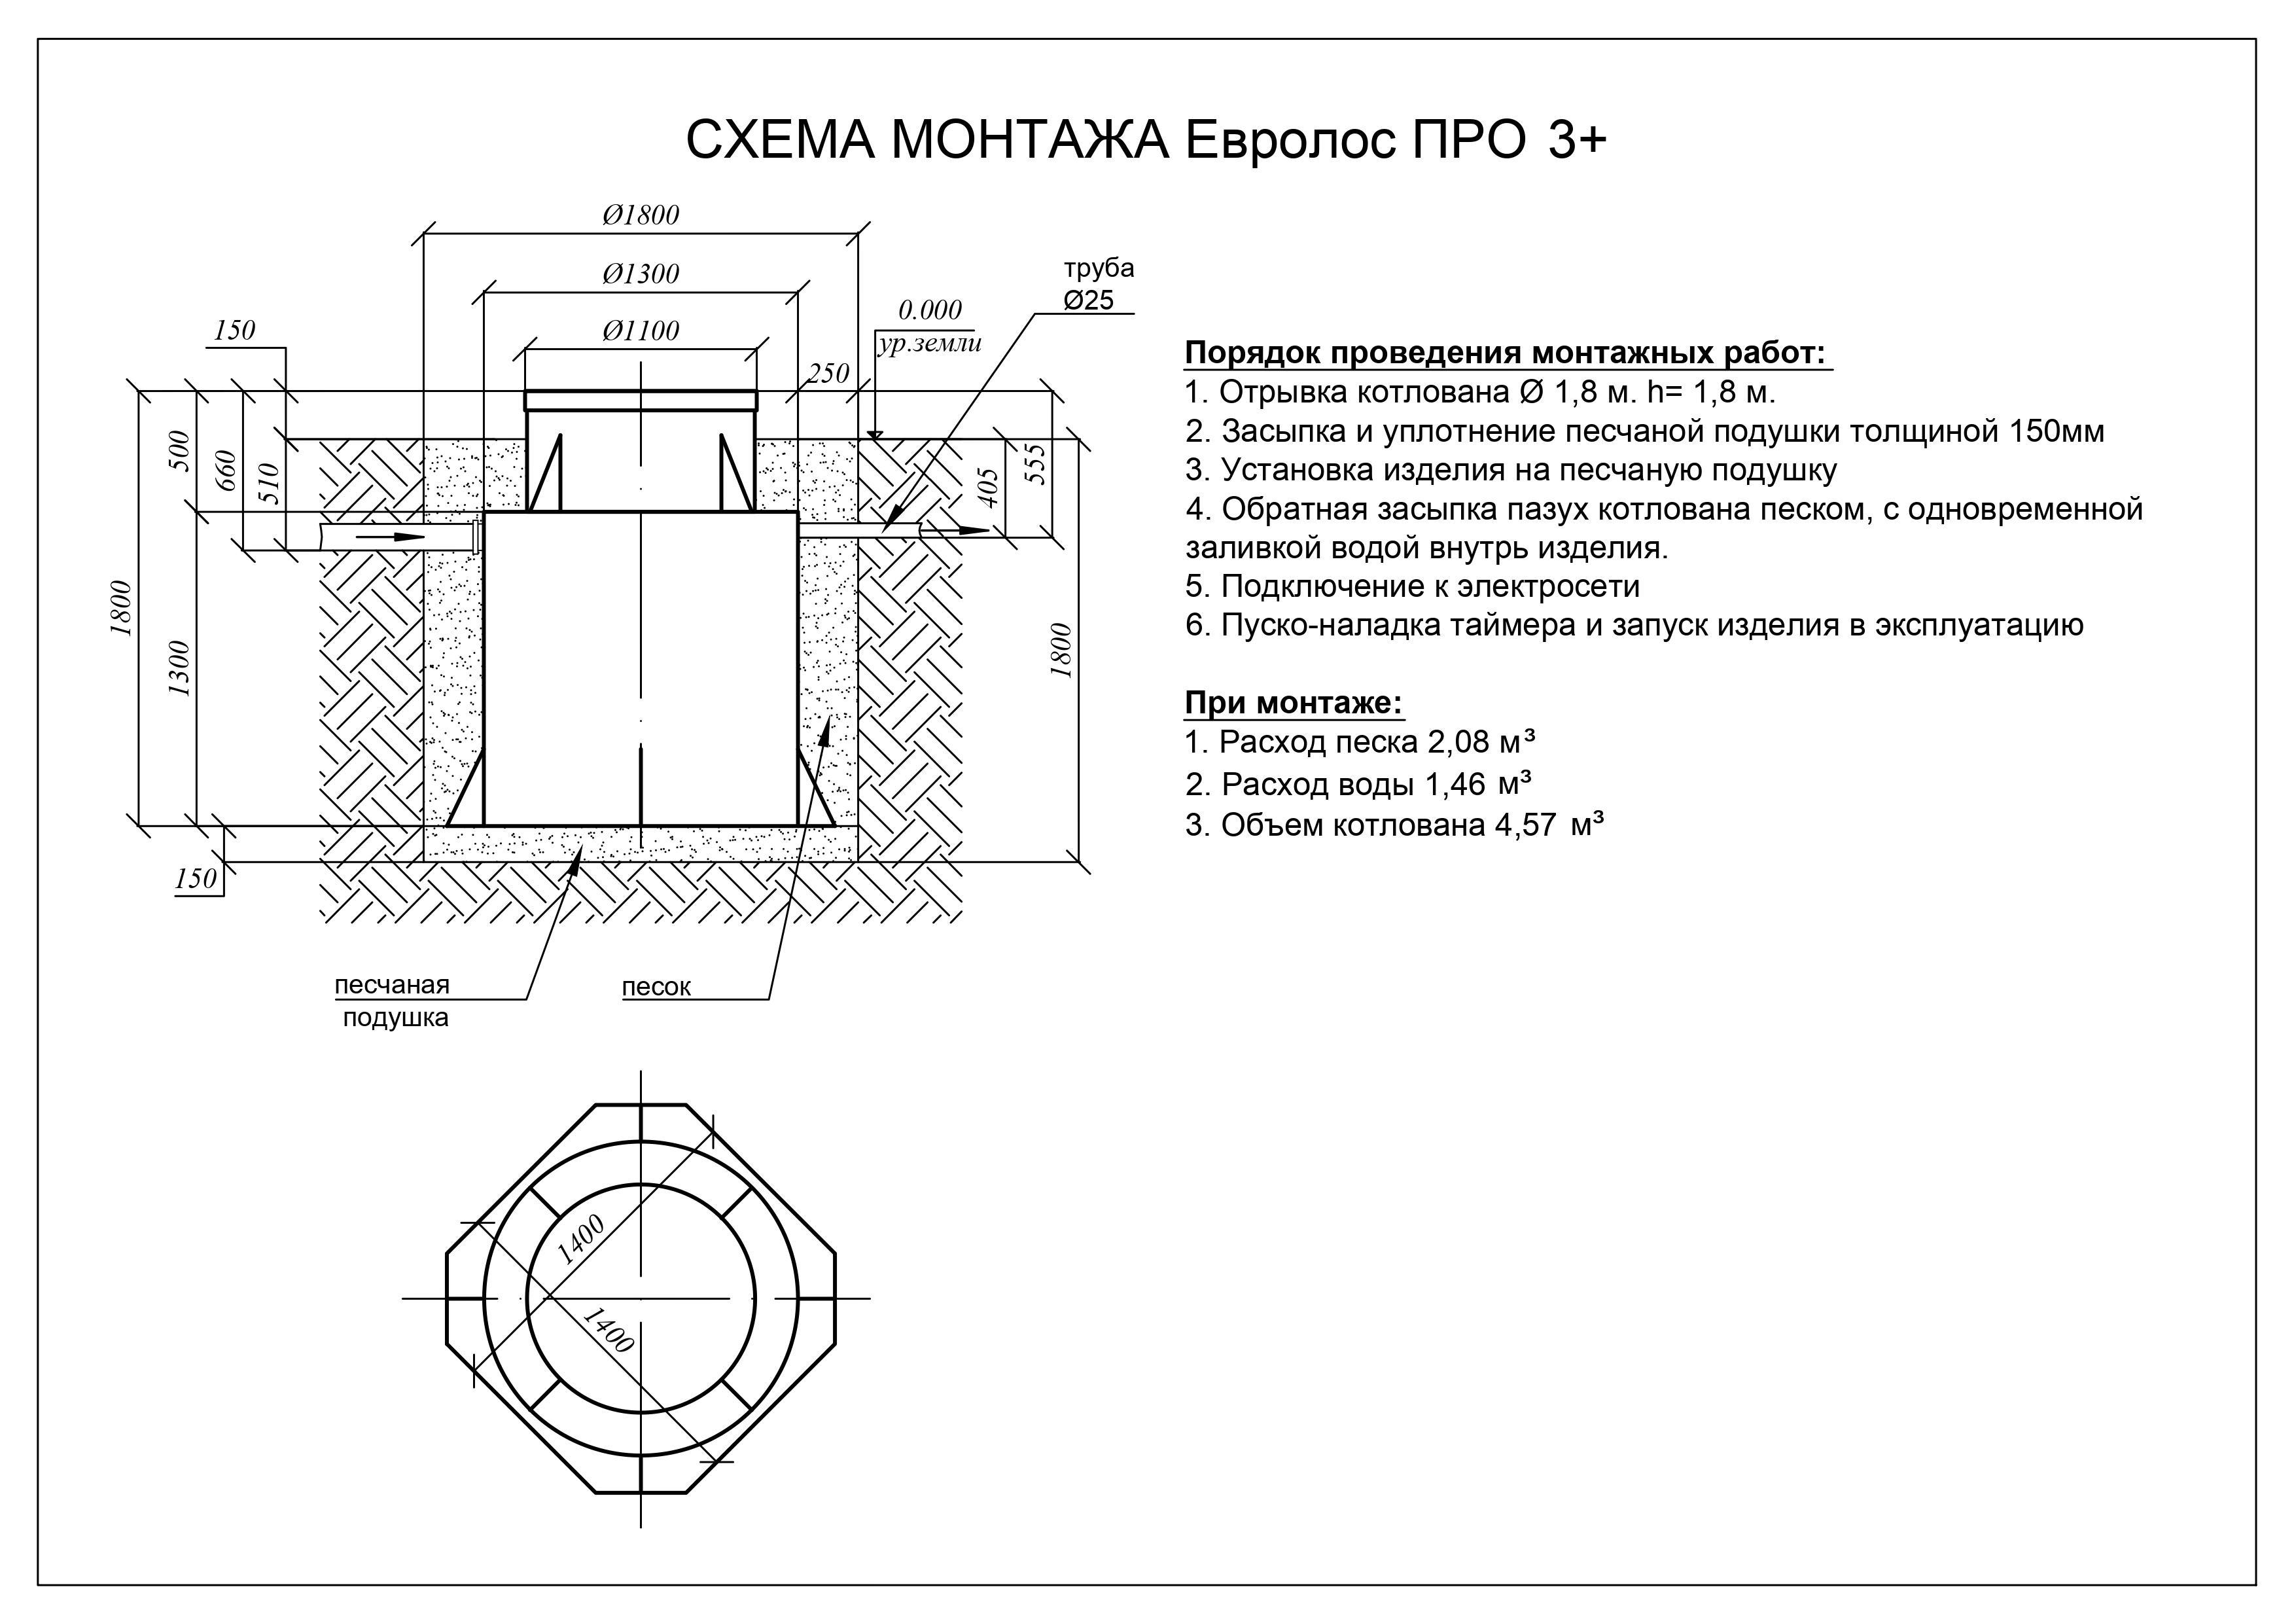 Схема монтажа станции очистки Евролос ПРО 3 +